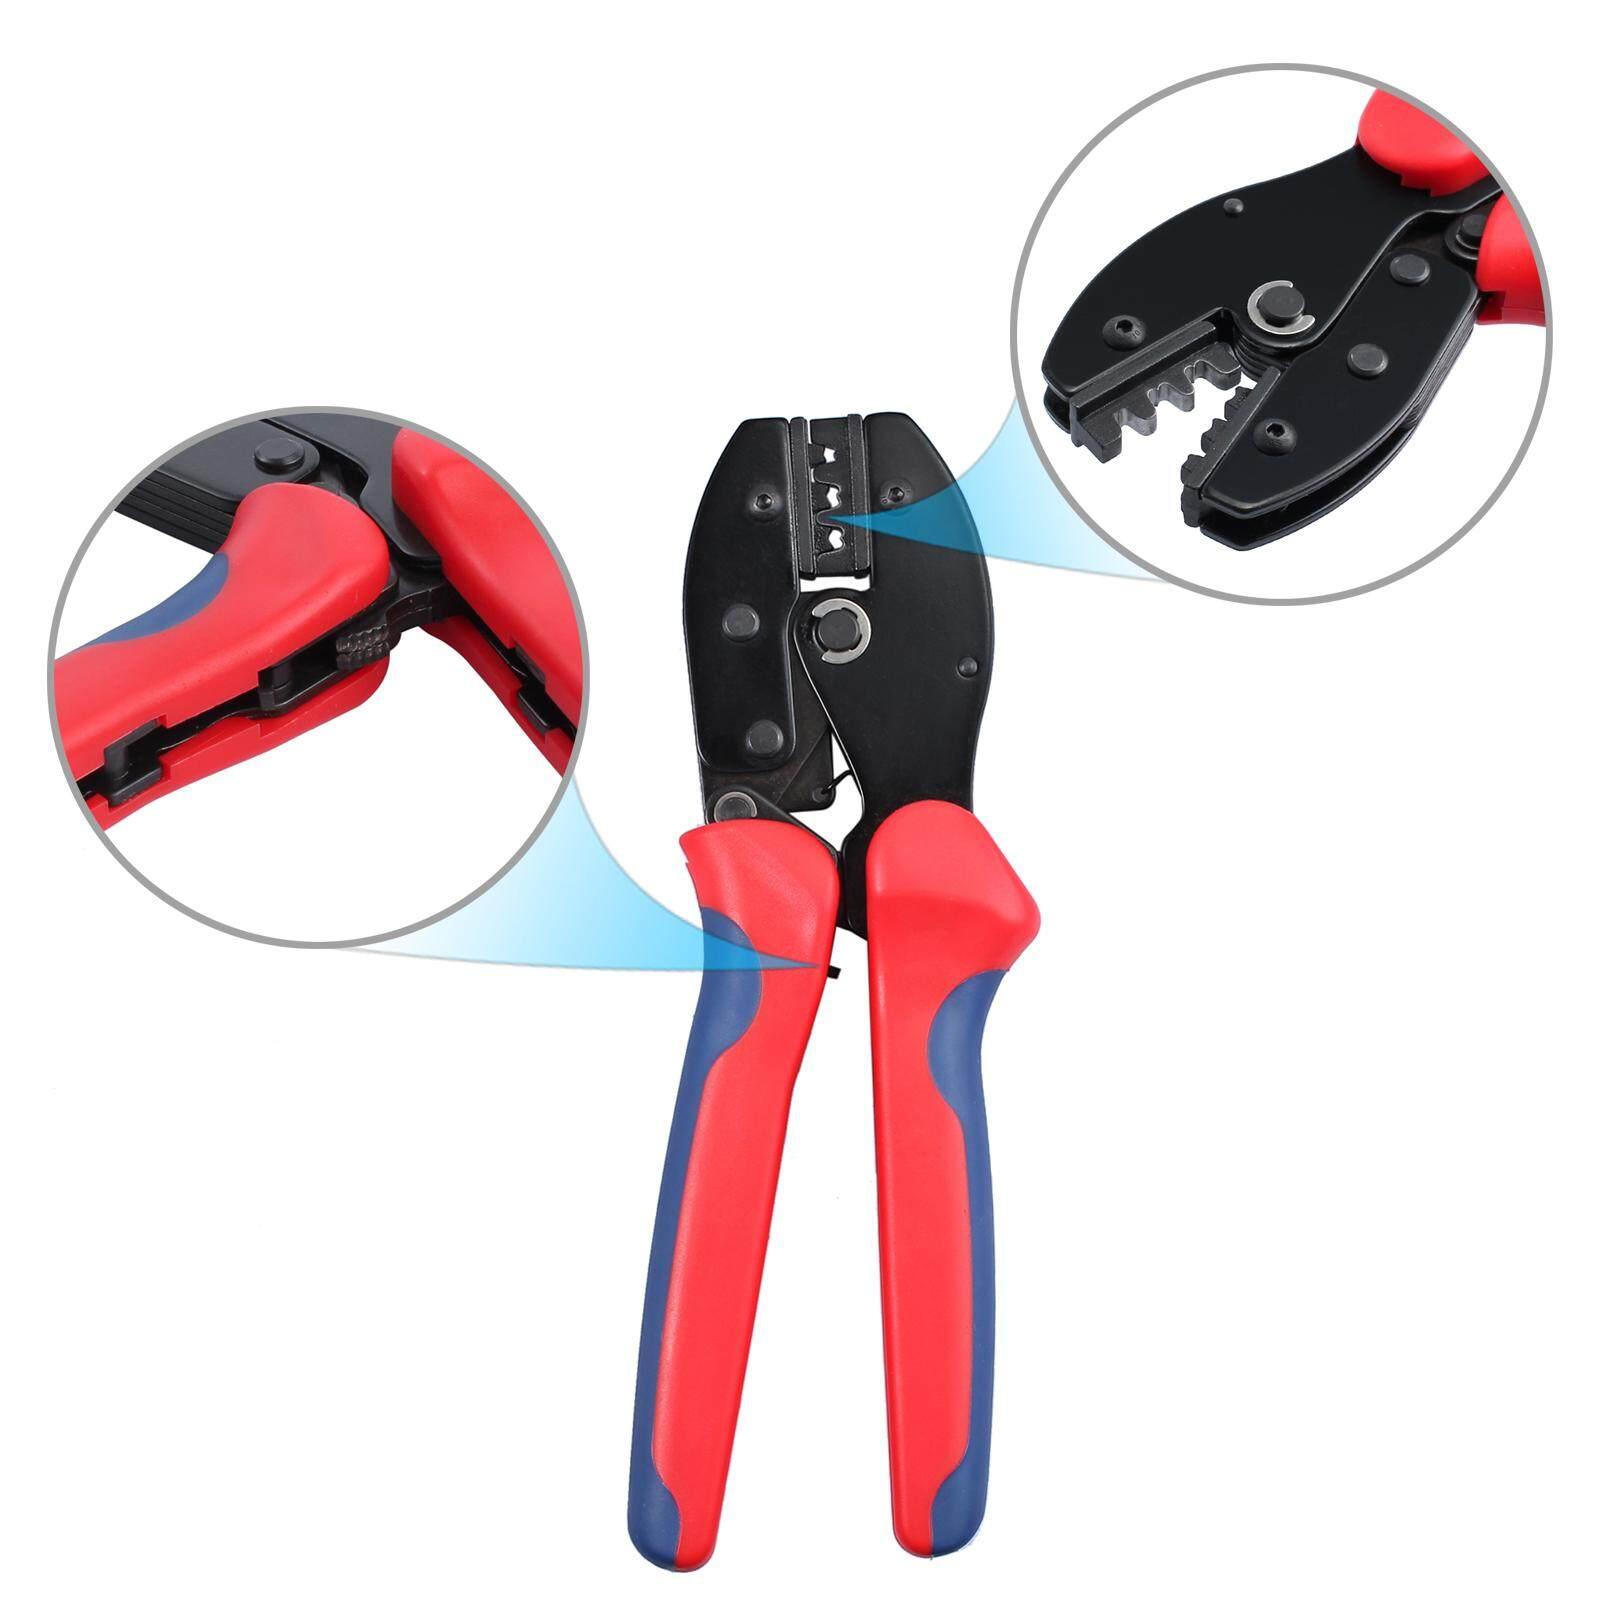 10 Pairs connectors MC3 MC4 Solar Crimping Tools kit wire crimper spanner